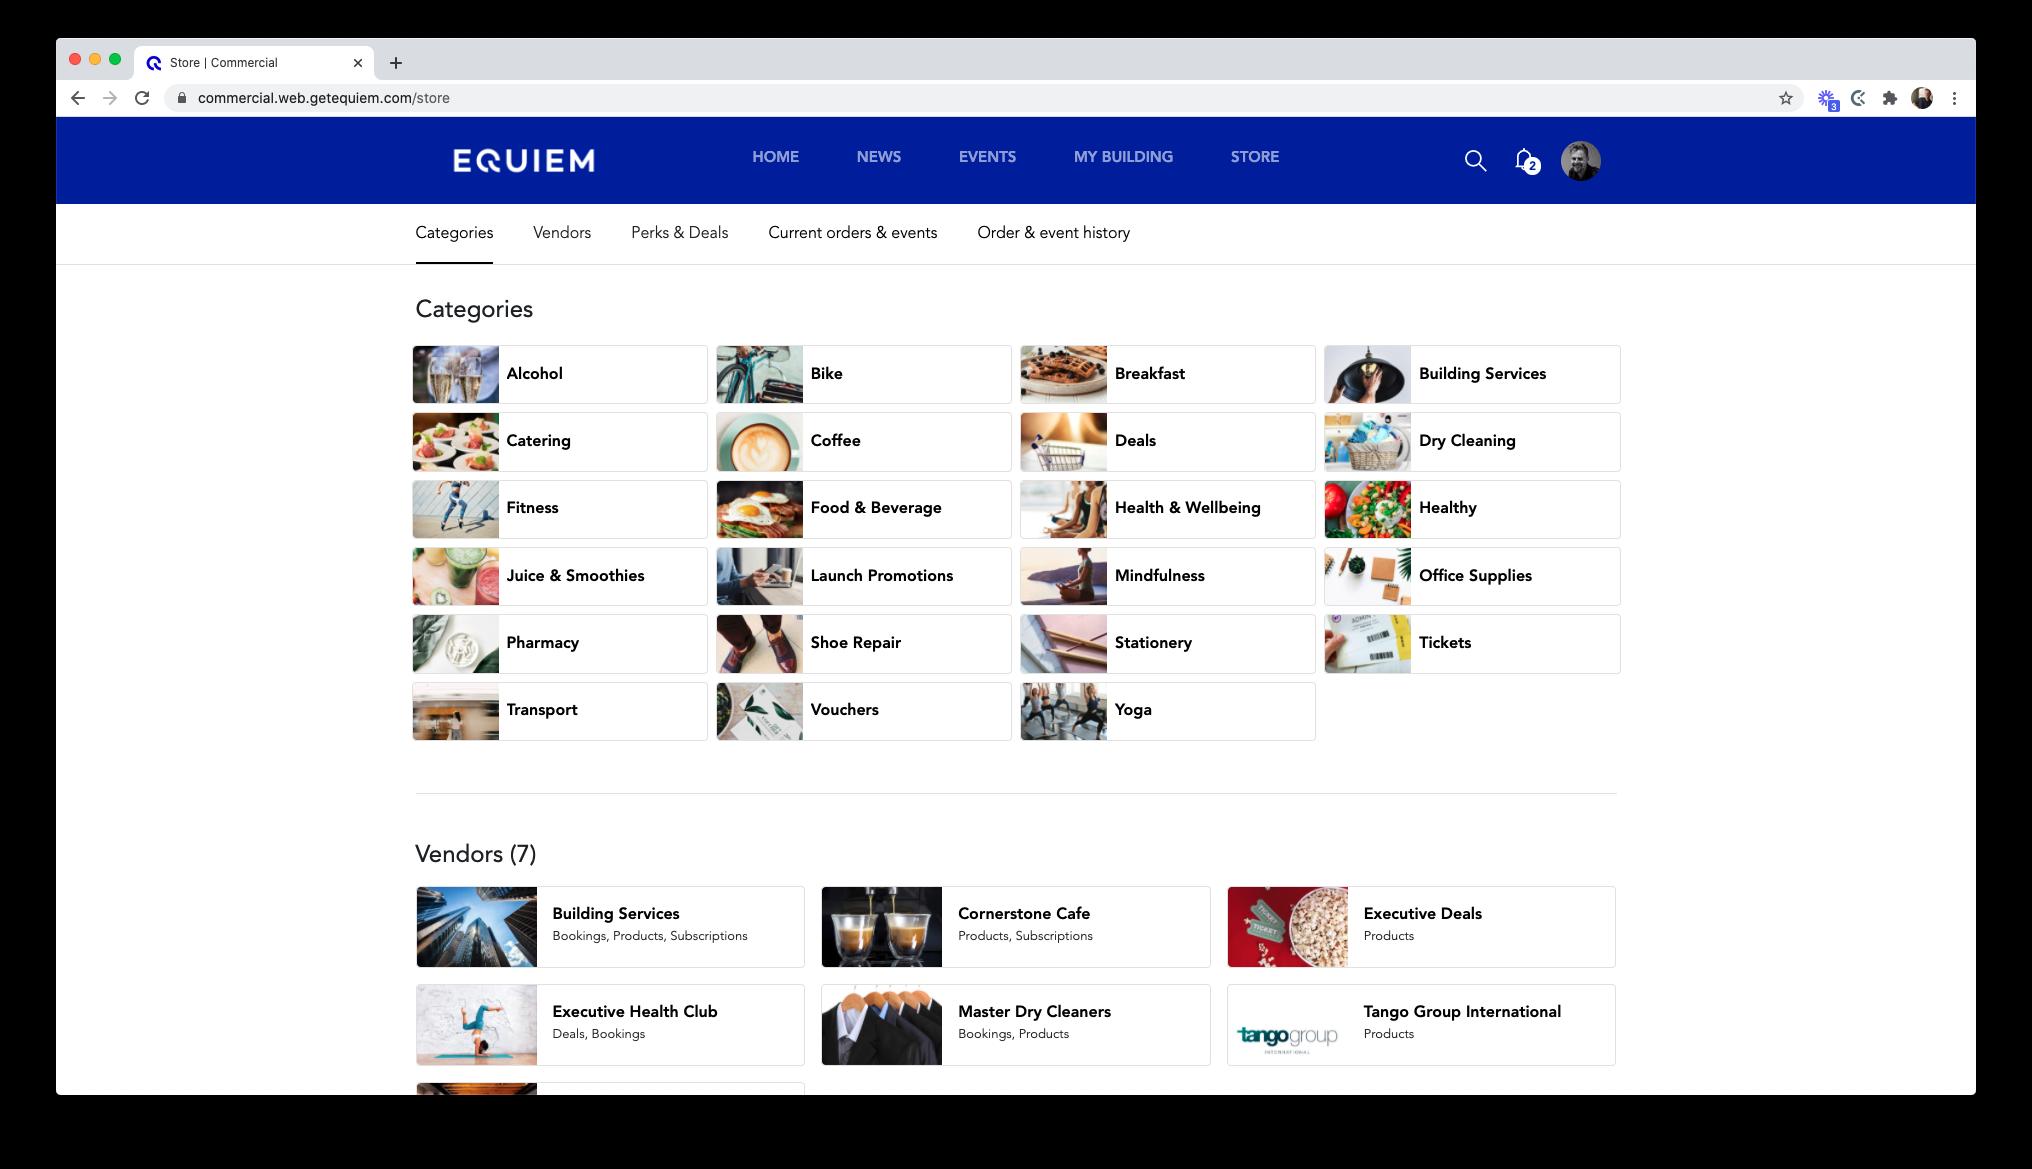 The store page of Equiem's marketplace e-commerce platform.